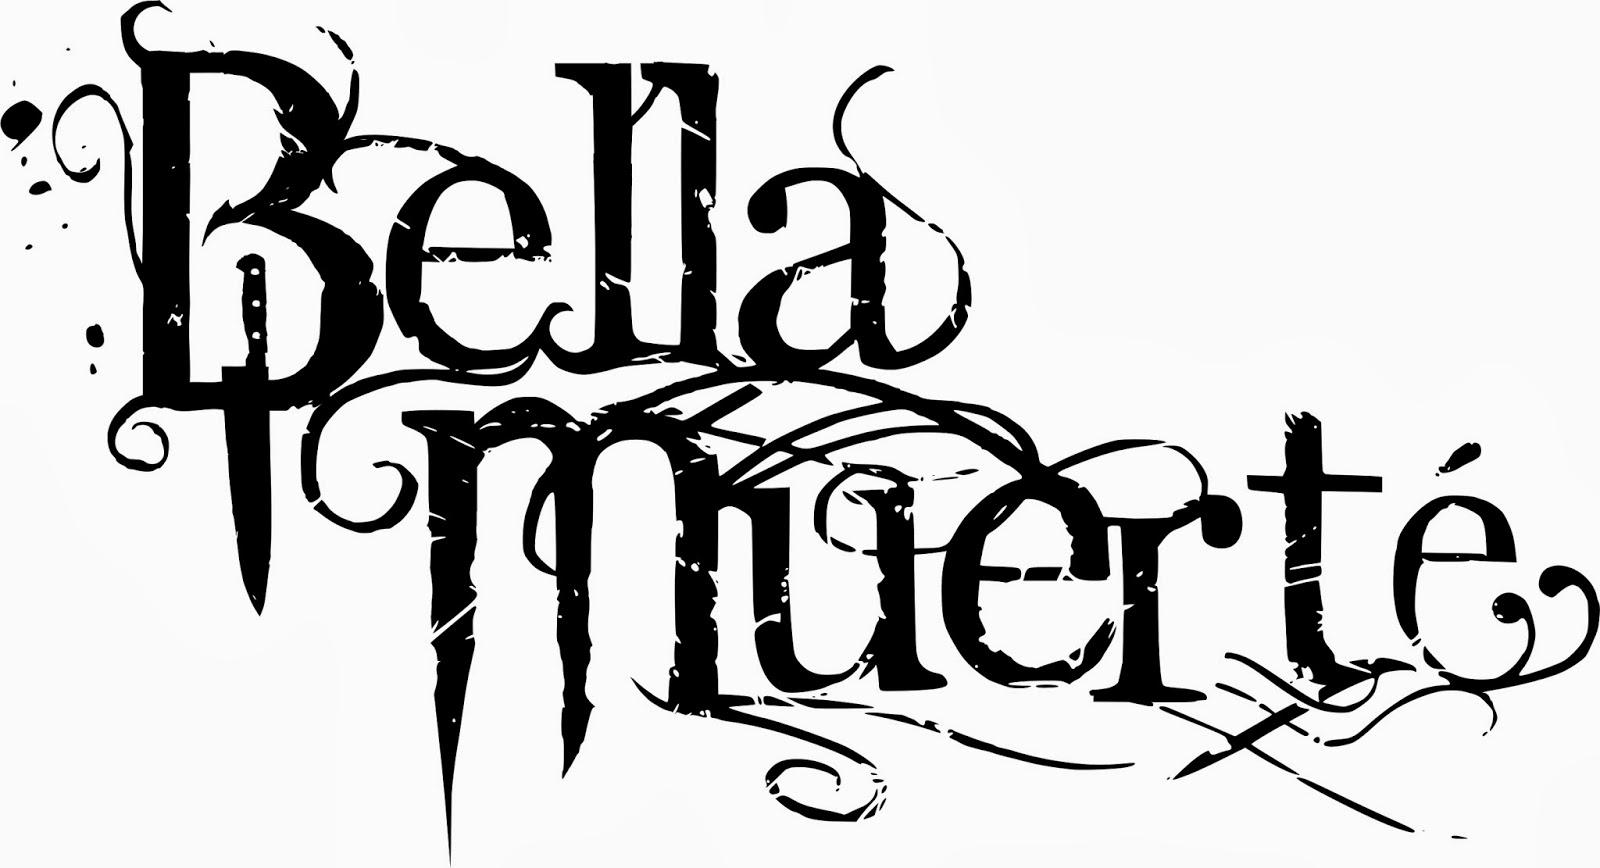 Bella Muerte's Bret Talks Of New Music and Future Activity